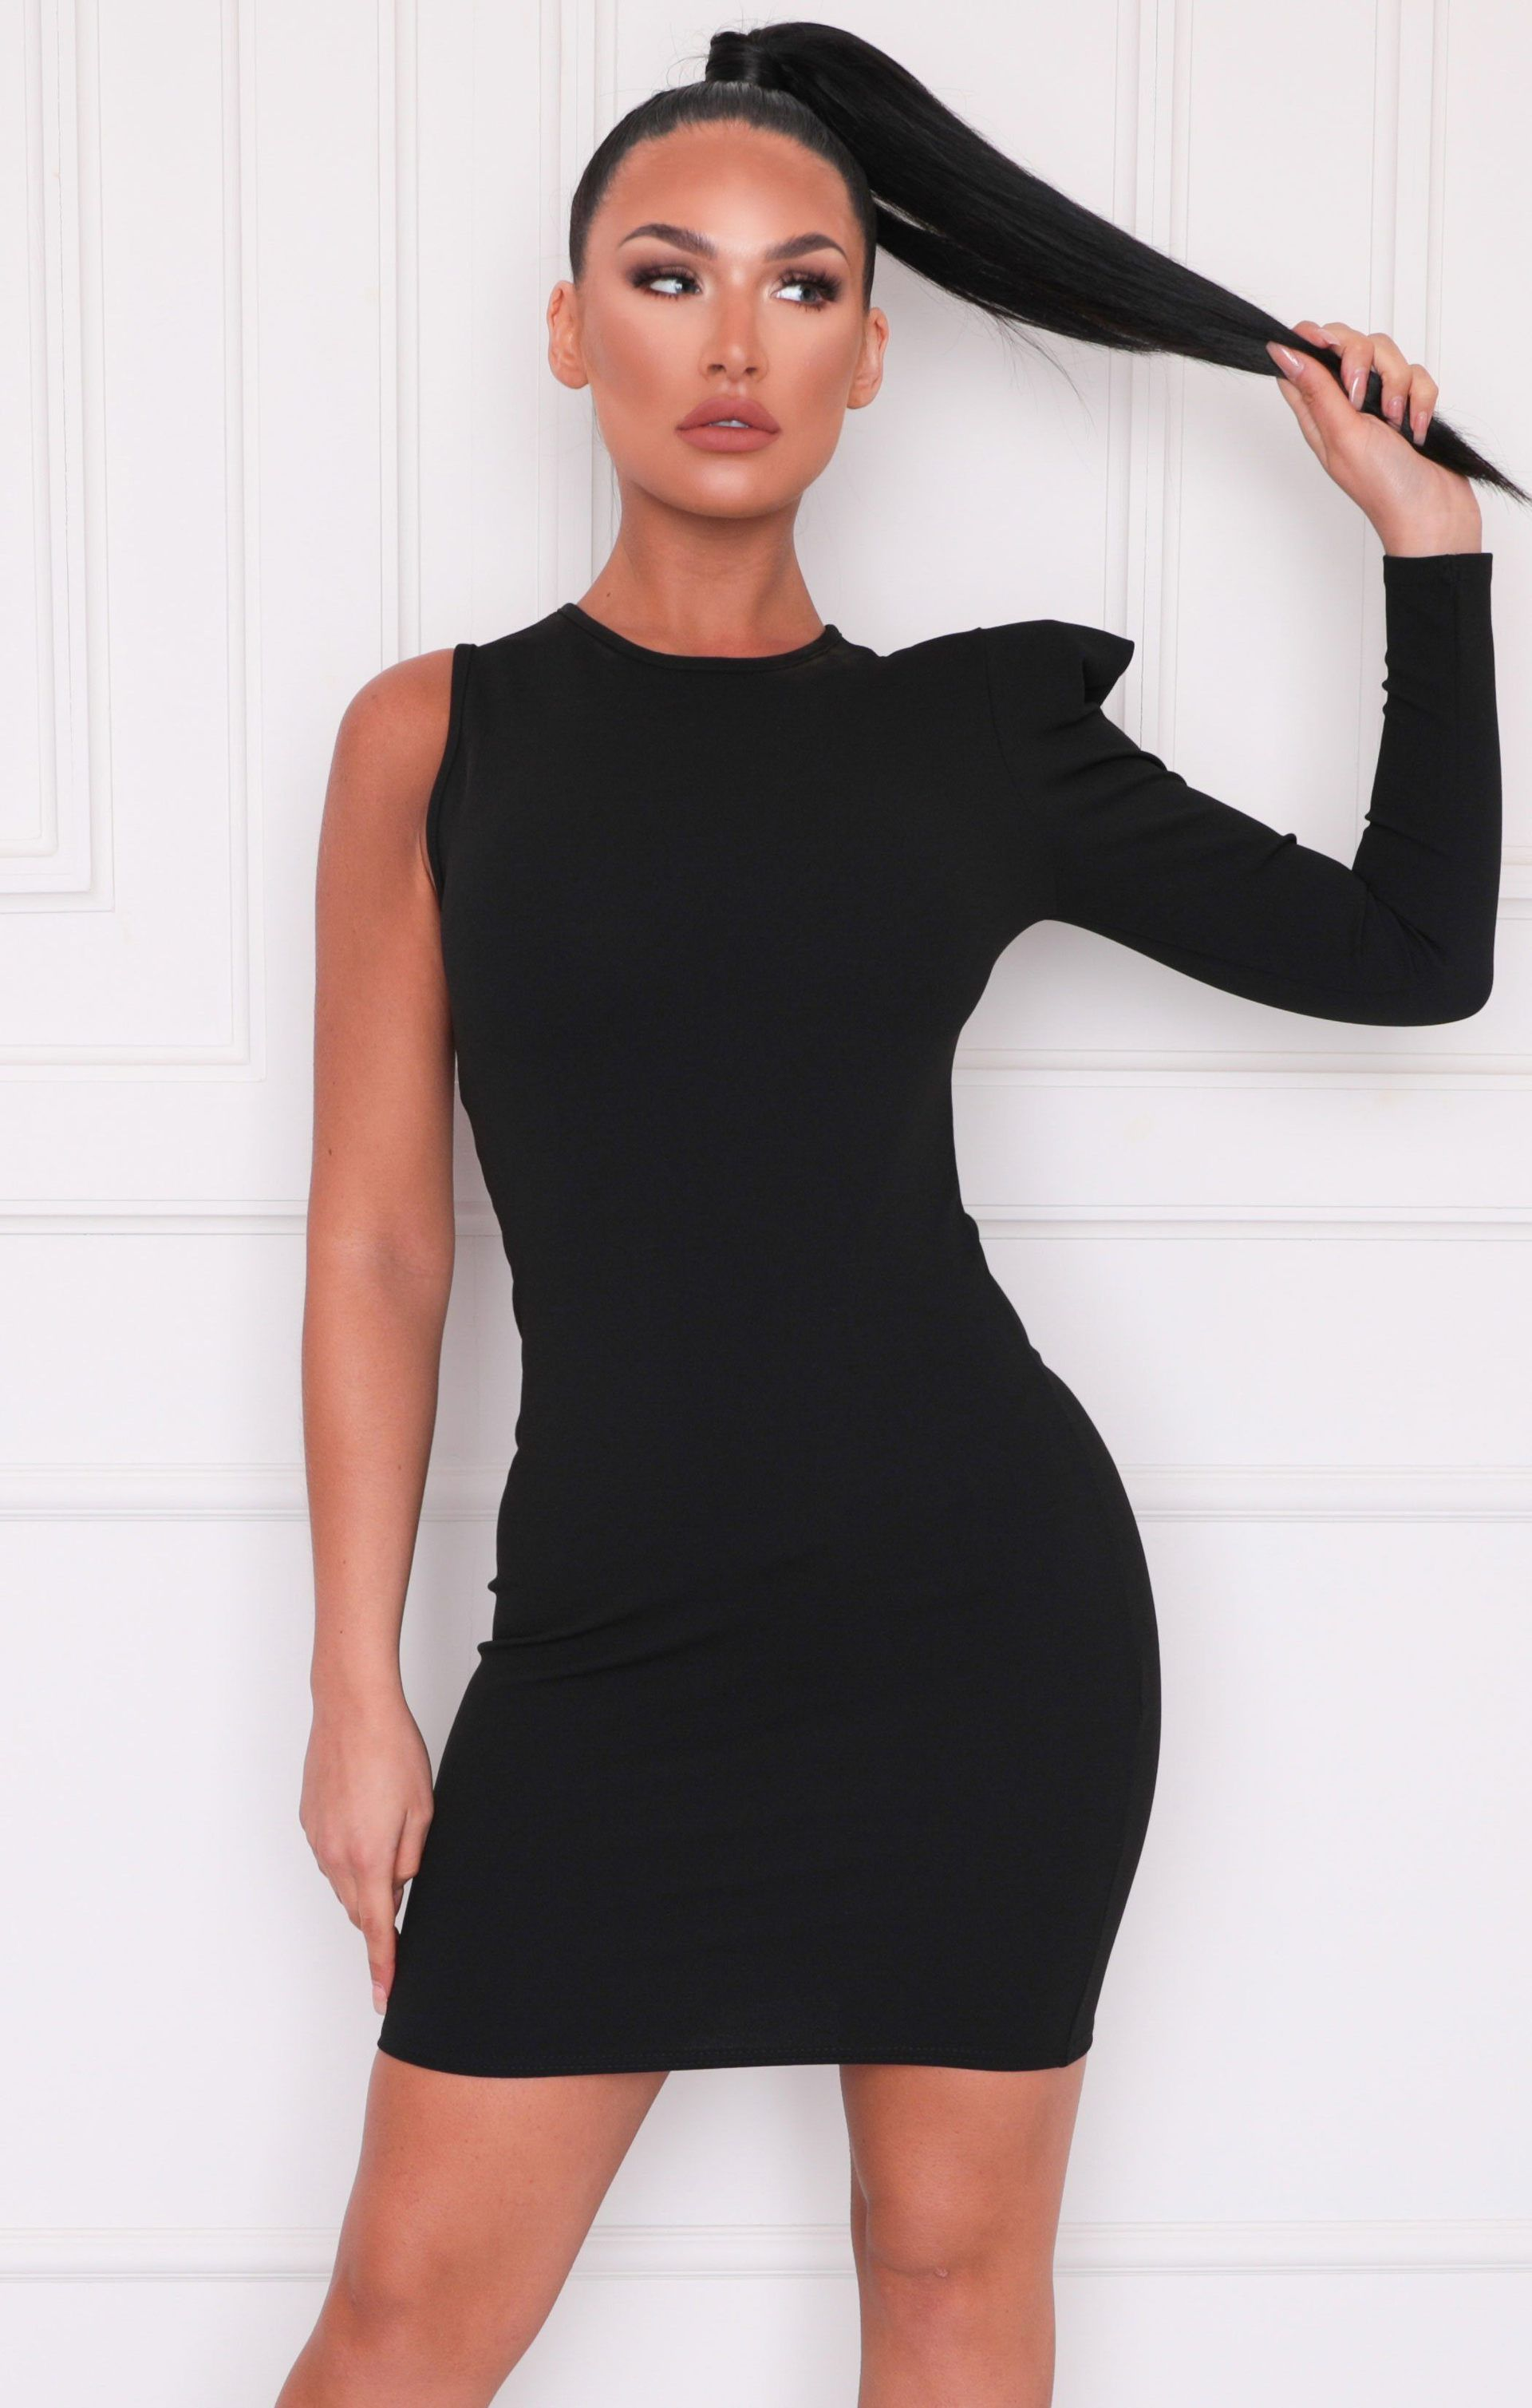 Black One Shoulder Padded Bodycon Mini Dress Unice In 2020 Dresses Power Dressing Shoulder Pads [ 3017 x 1920 Pixel ]